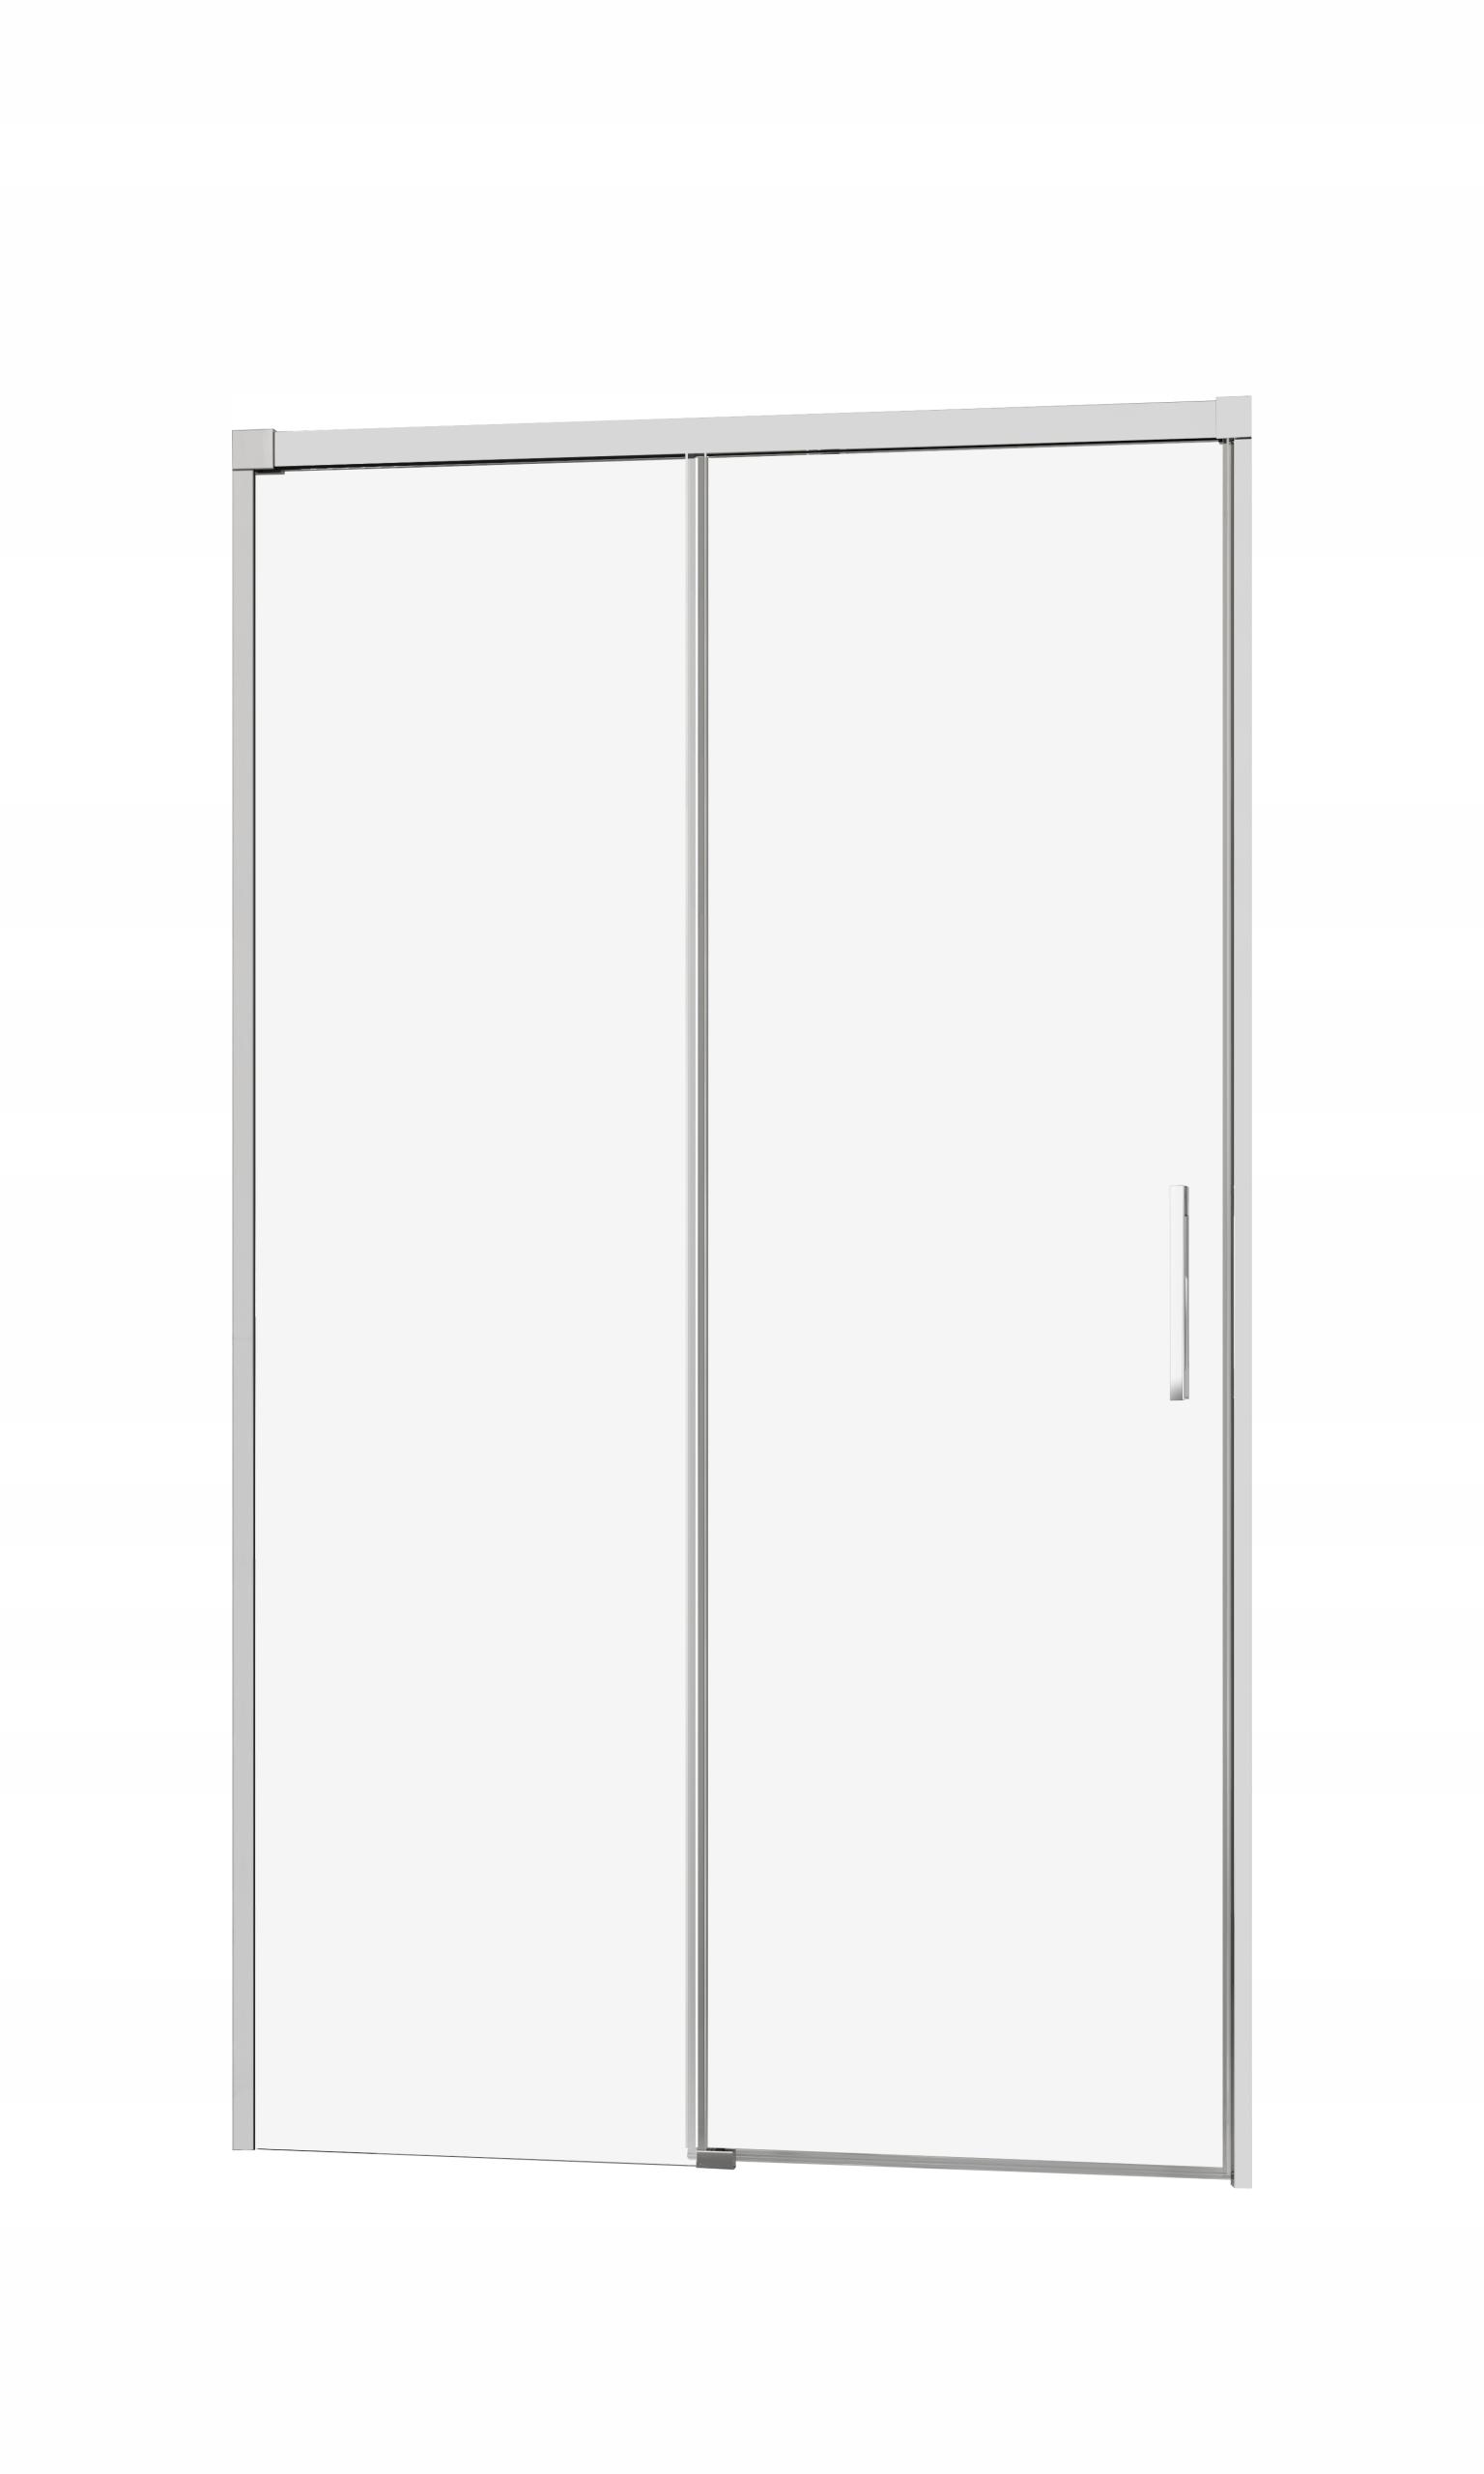 Sprchové dvere Nápad DWJ 120x200,5 cm RADAWAY